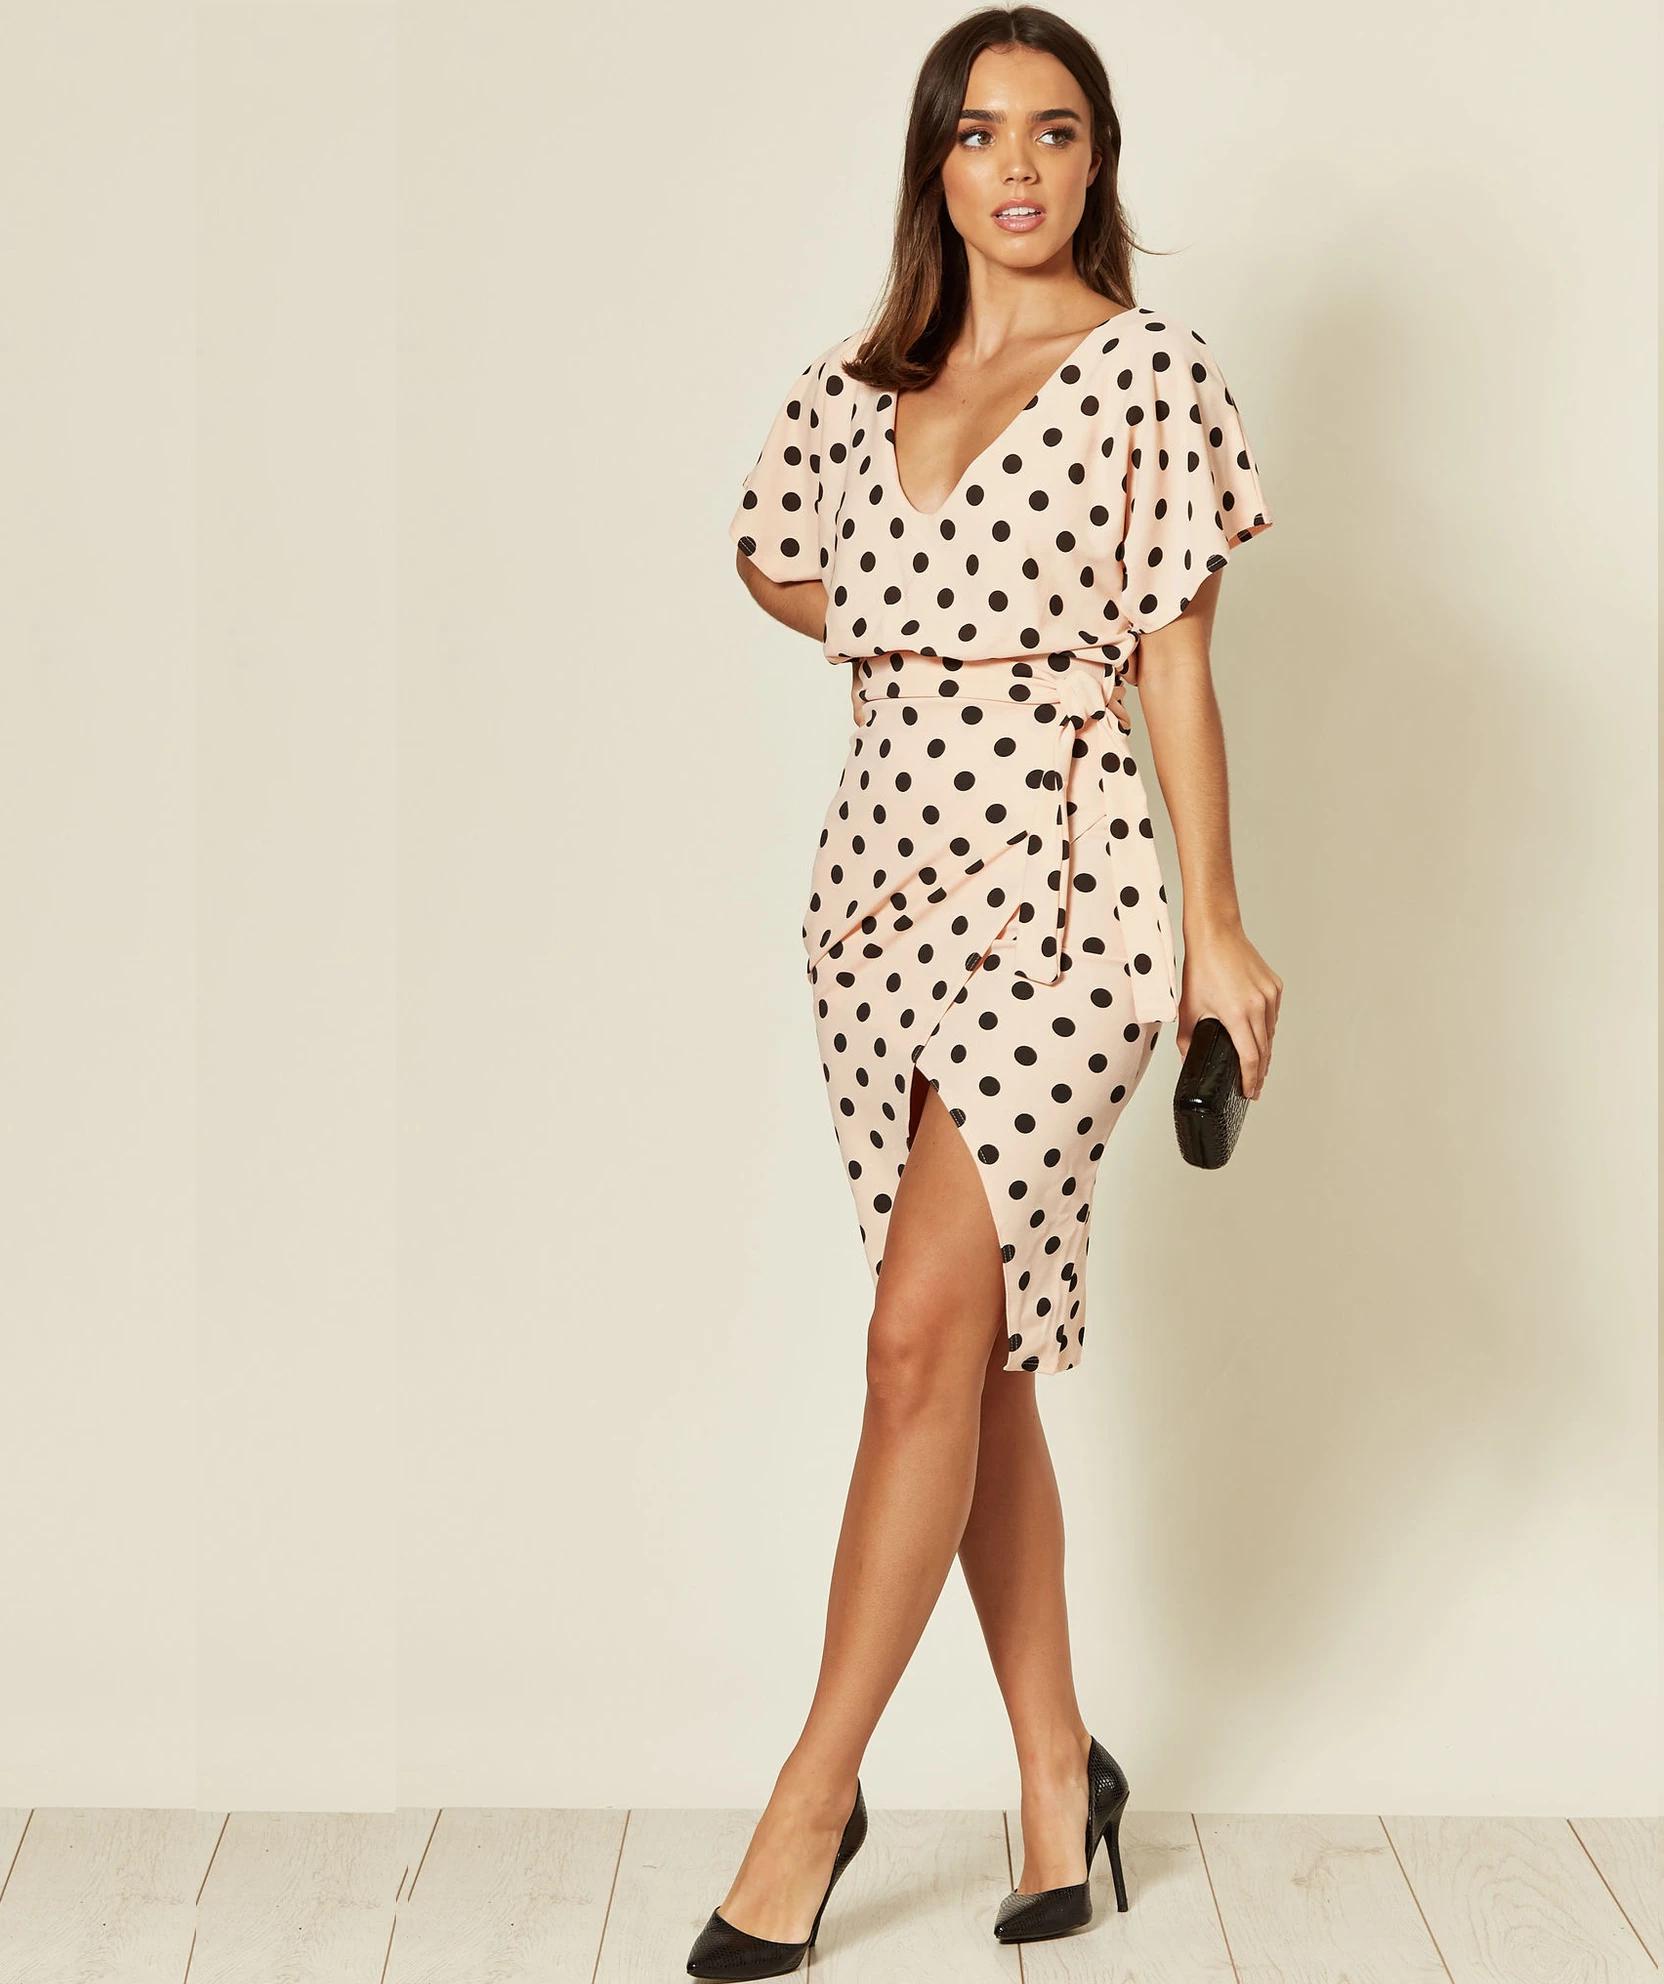 Maura Polka Dot V Neck Judith Batwing Wrap Dress (4 colour options) £11.50 delivered @ Missfiga